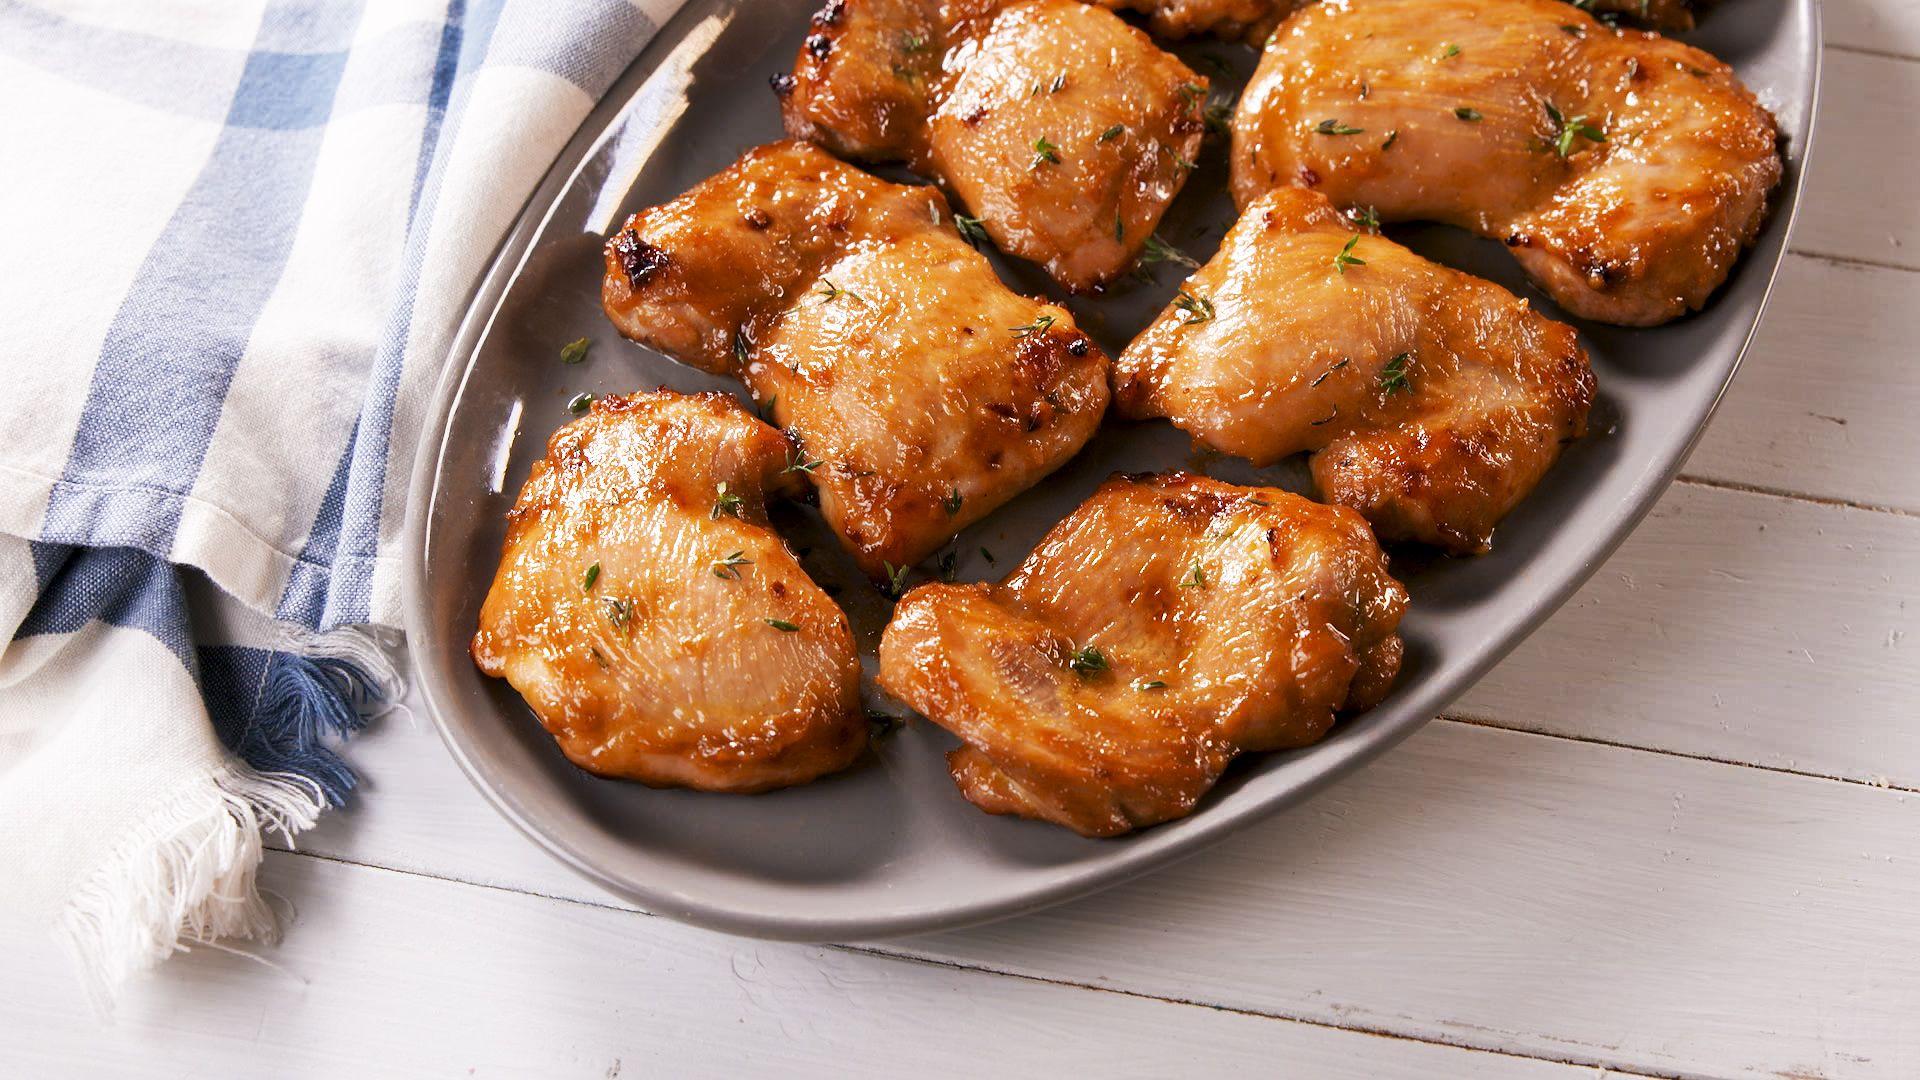 Baked Boneless Chicken Thighs